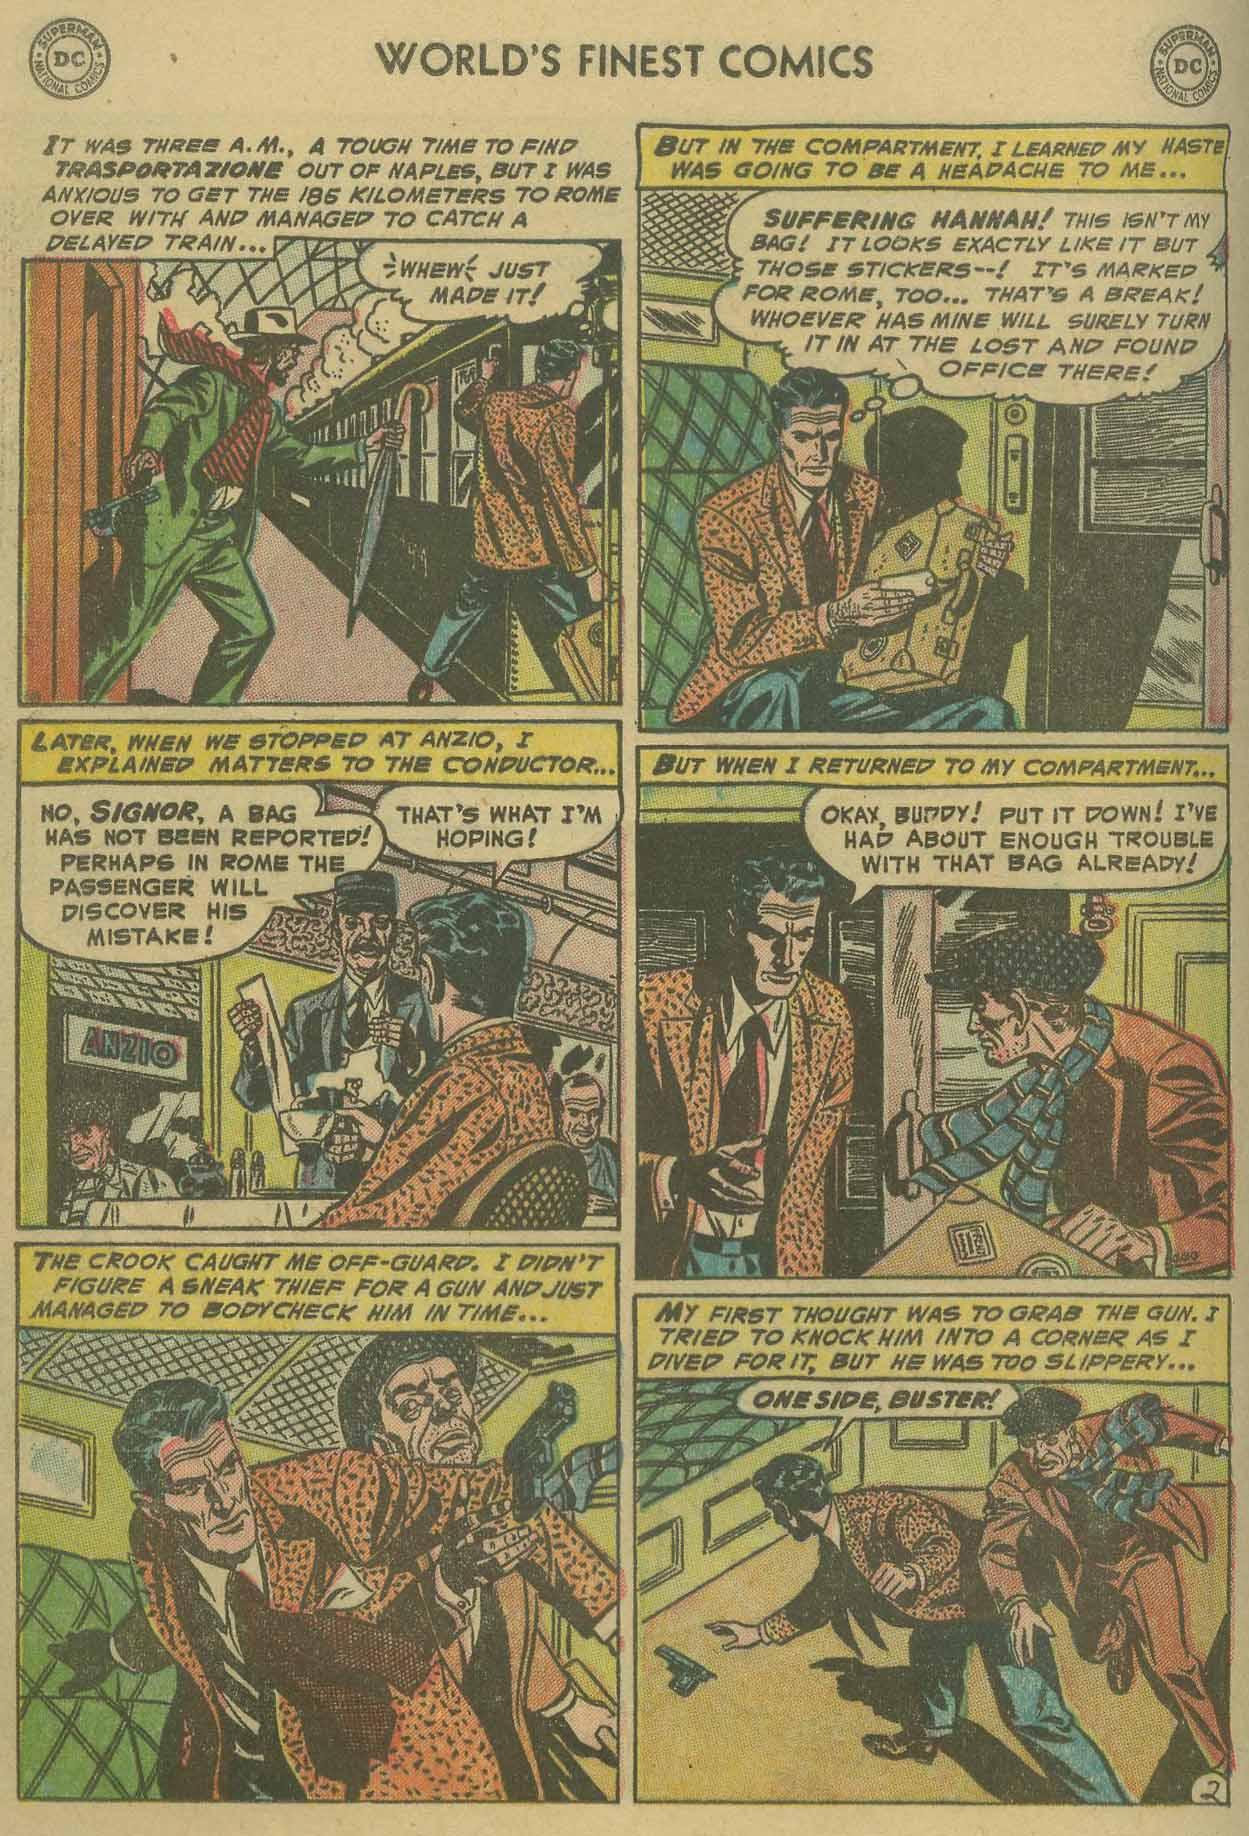 Read online World's Finest Comics comic -  Issue #69 - 44